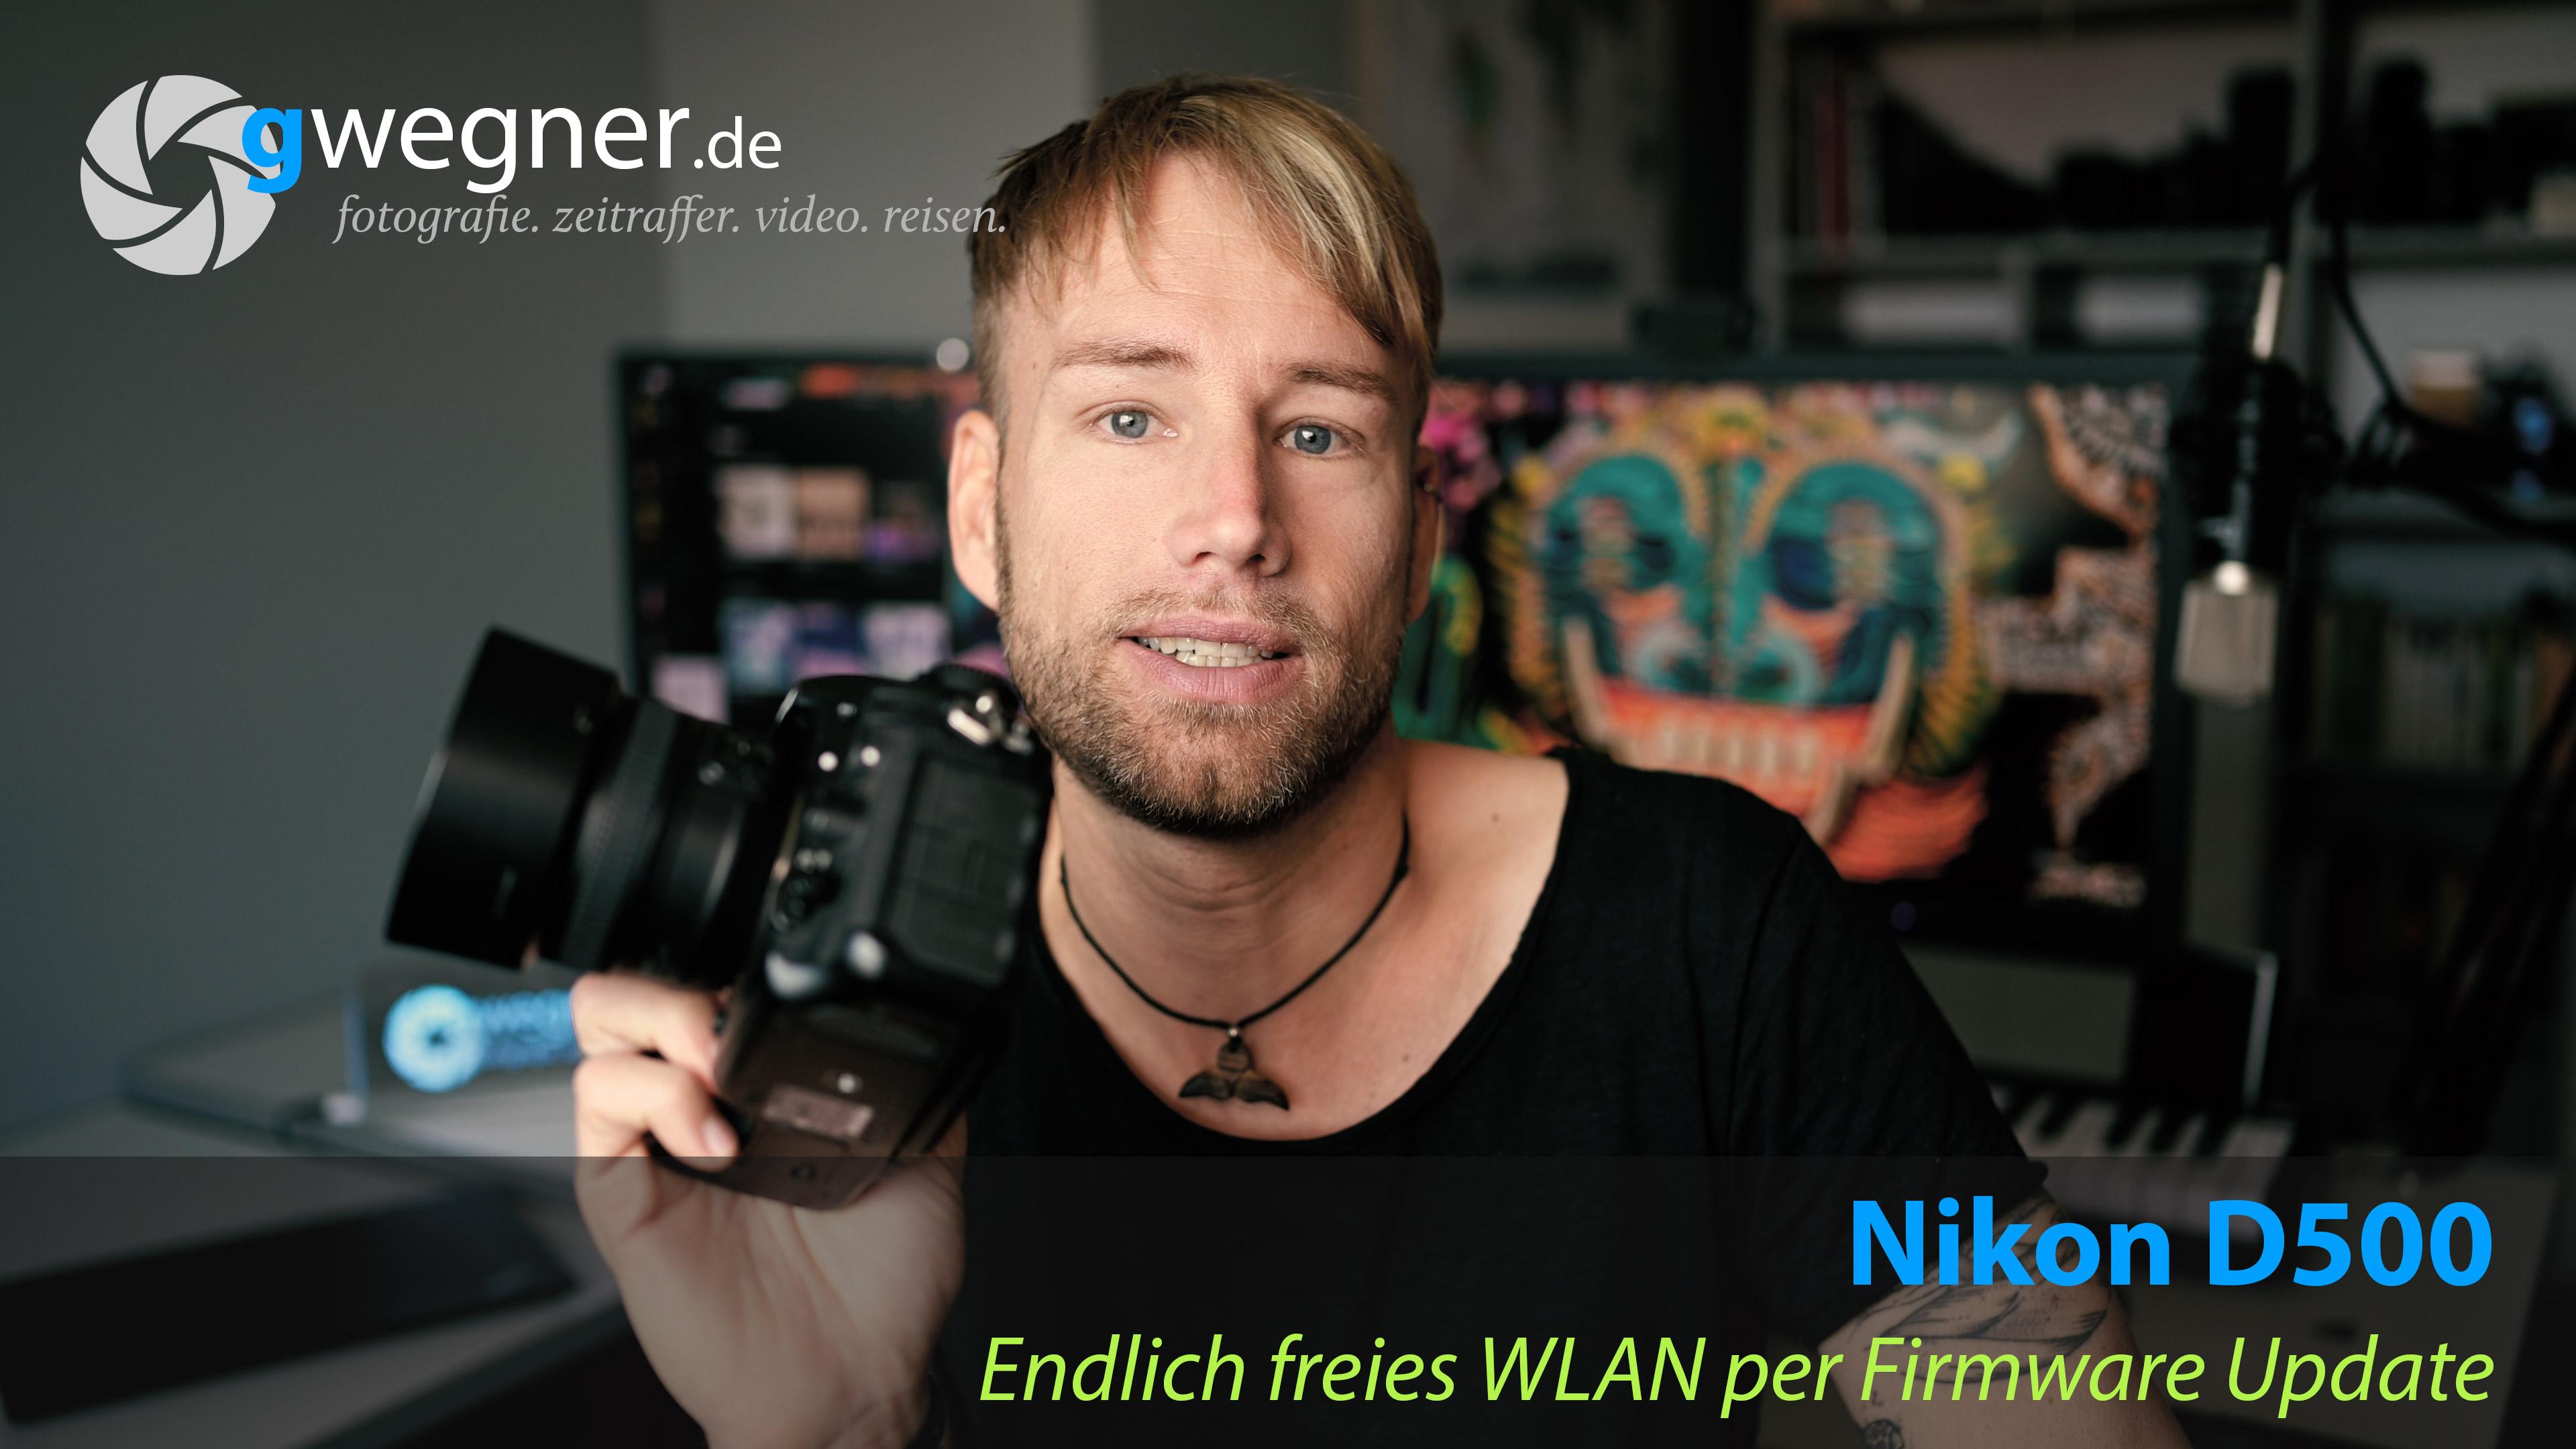 Nikon D500 – endlich freies WLAN per Firmware Update! (Video)